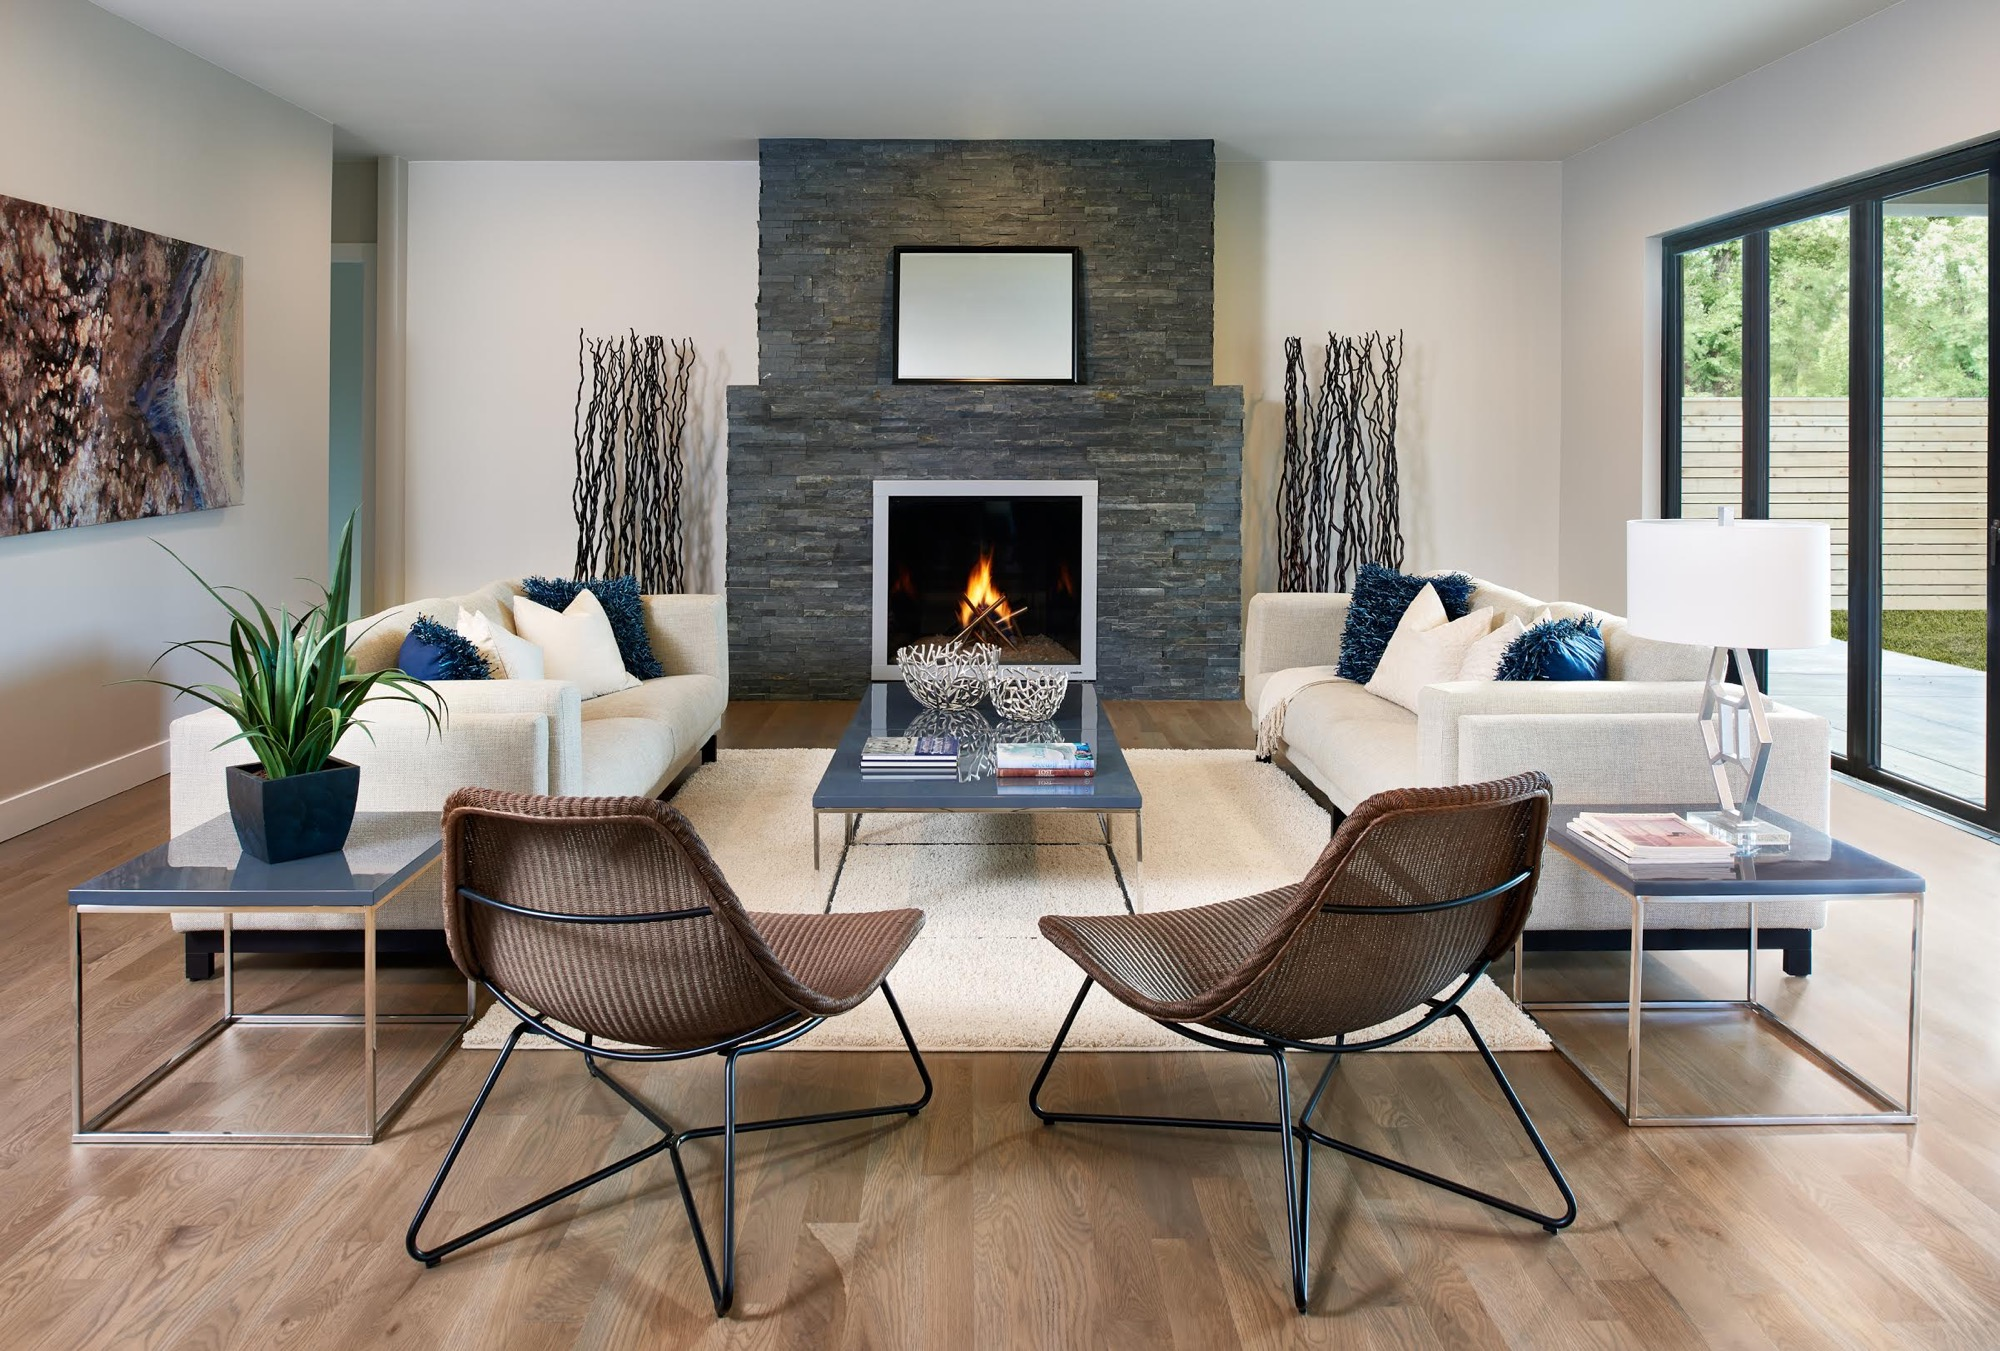 renovation home ideas